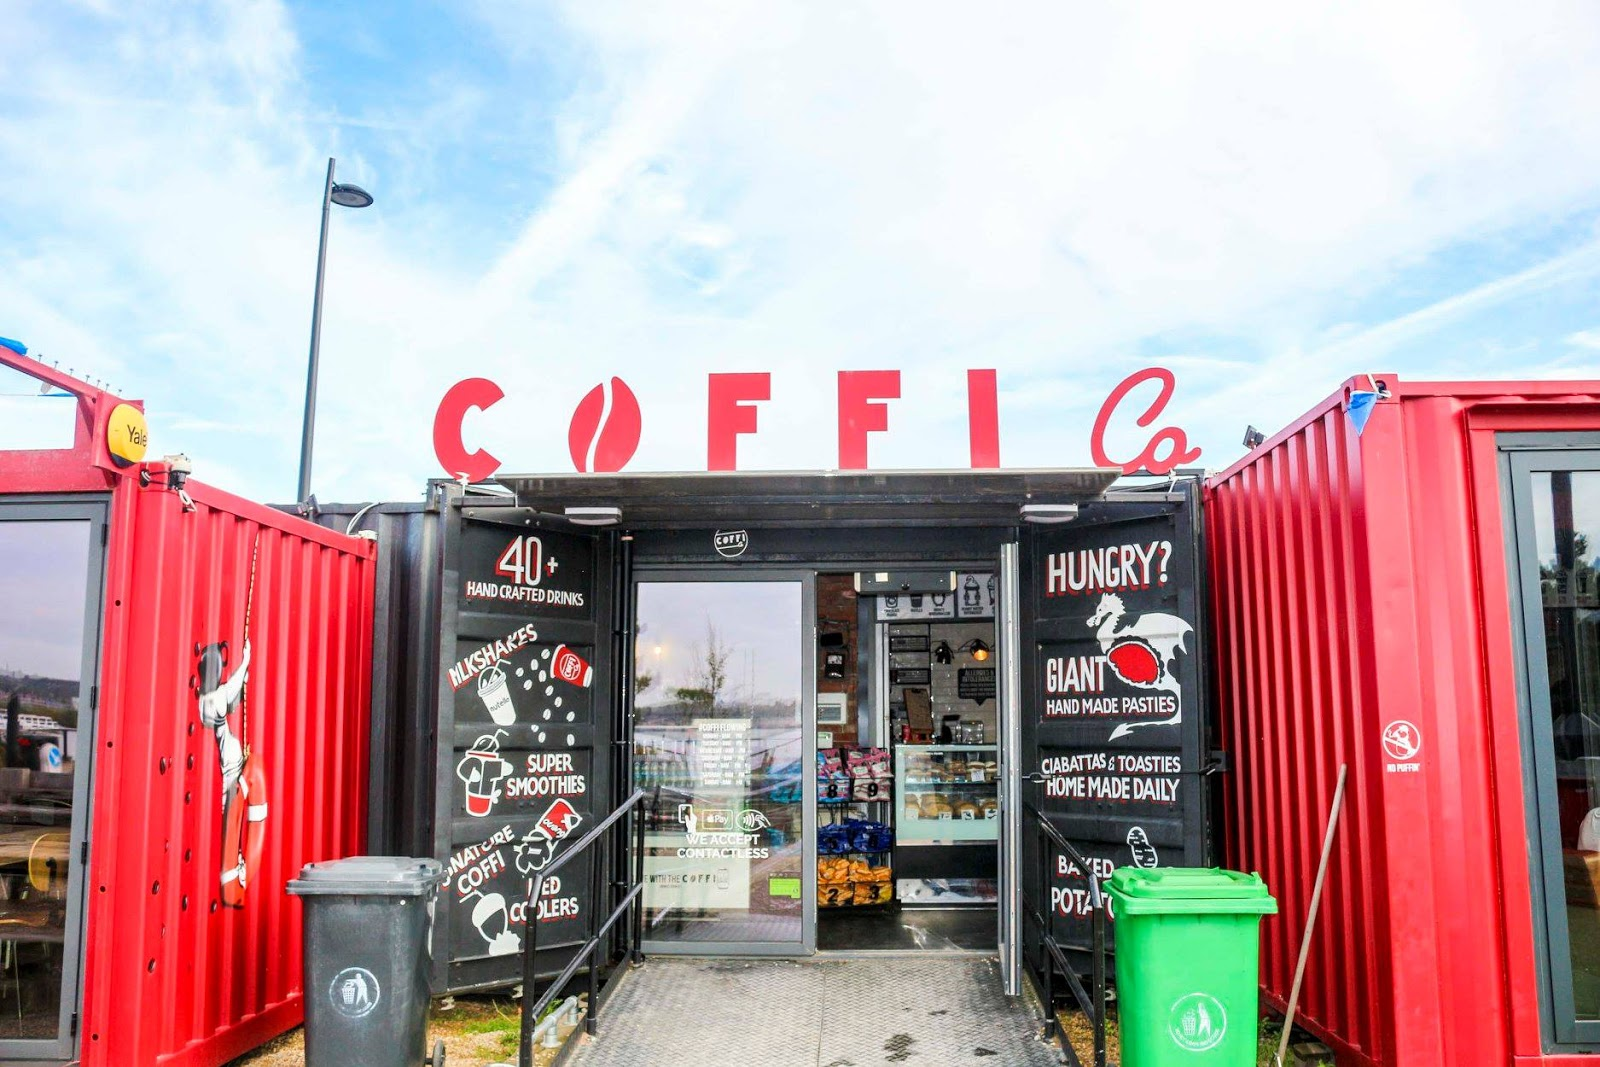 Cardiff Bay Coffee